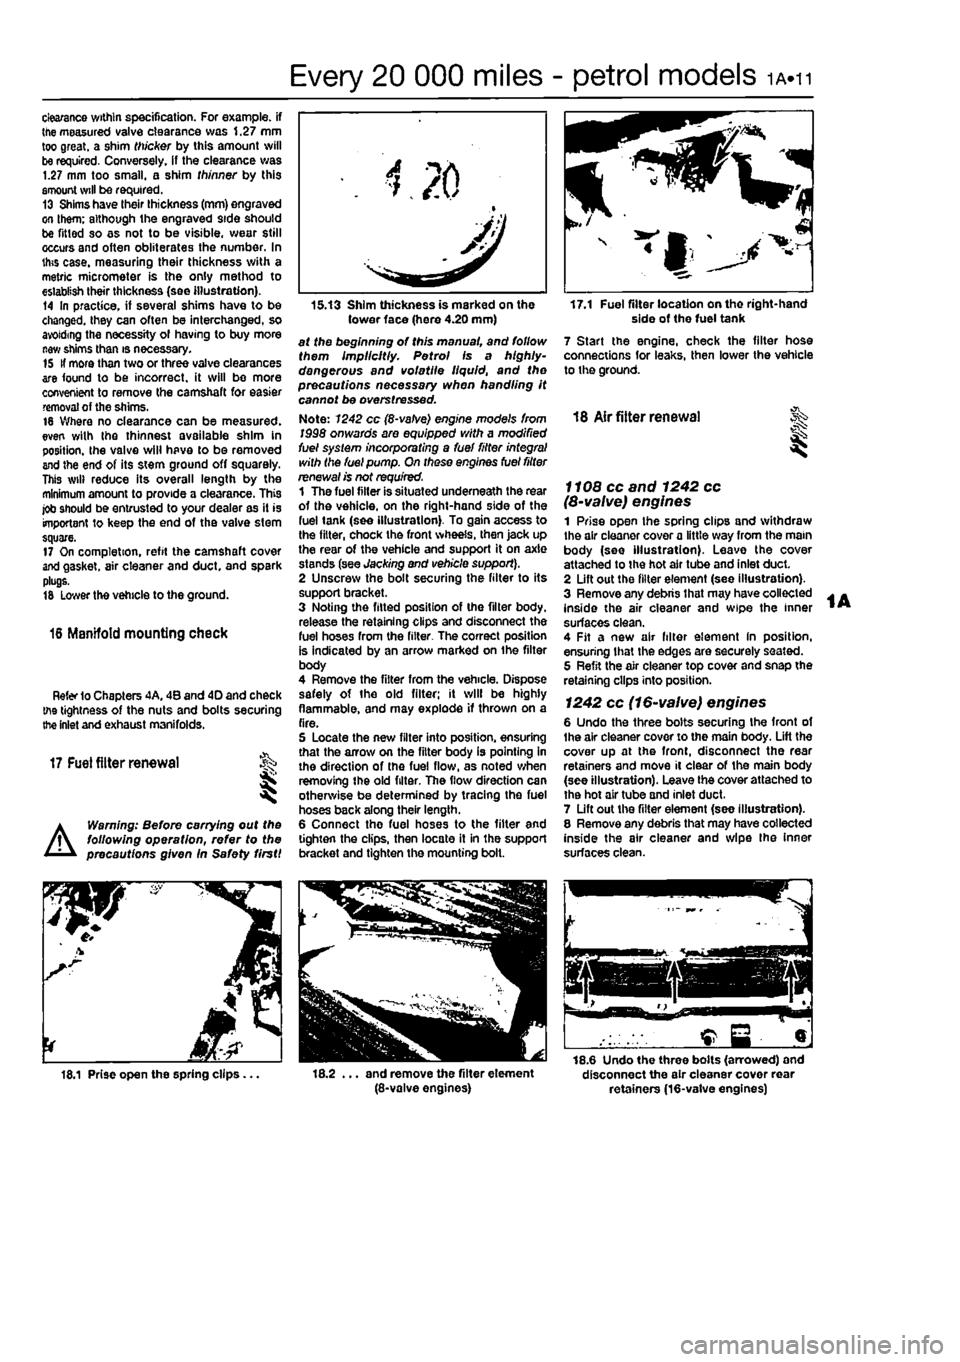 FIAT PUNTO 1994 176 / 1.G Workshop Manual